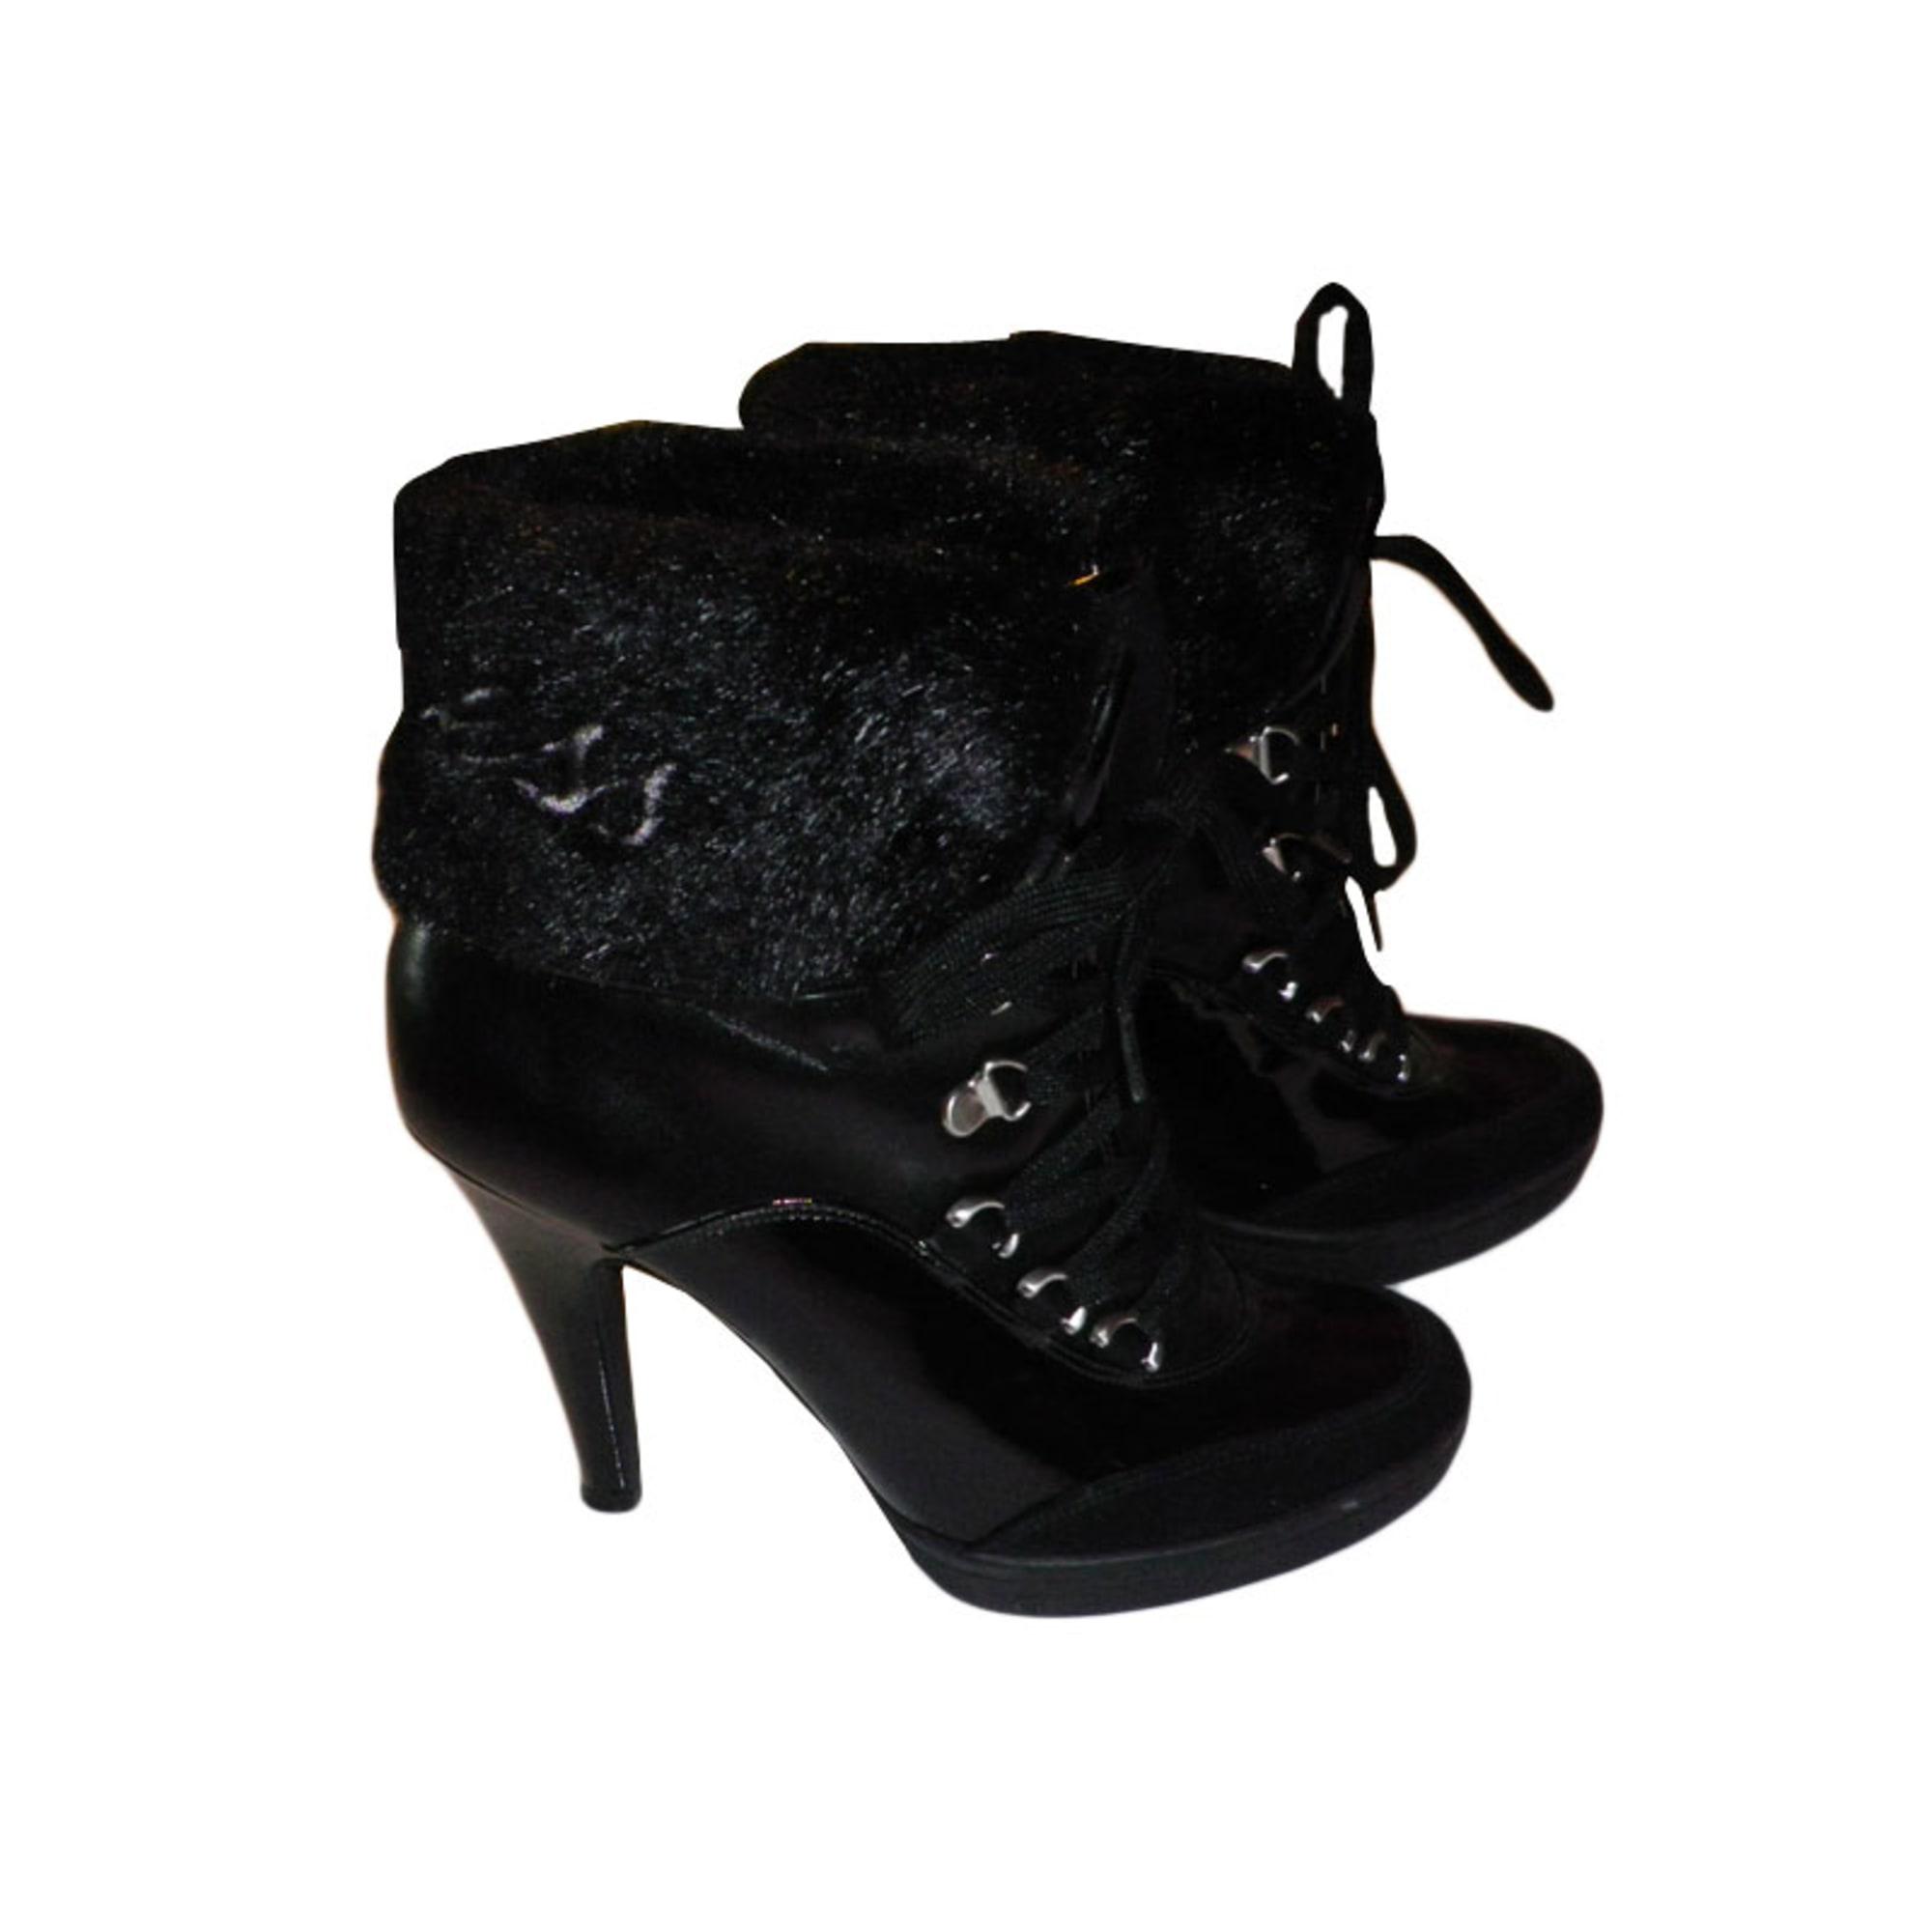 526abffe1665 High Heel Ankle Boots GUESS 37 black vendu par Sabrina 73267745 ...